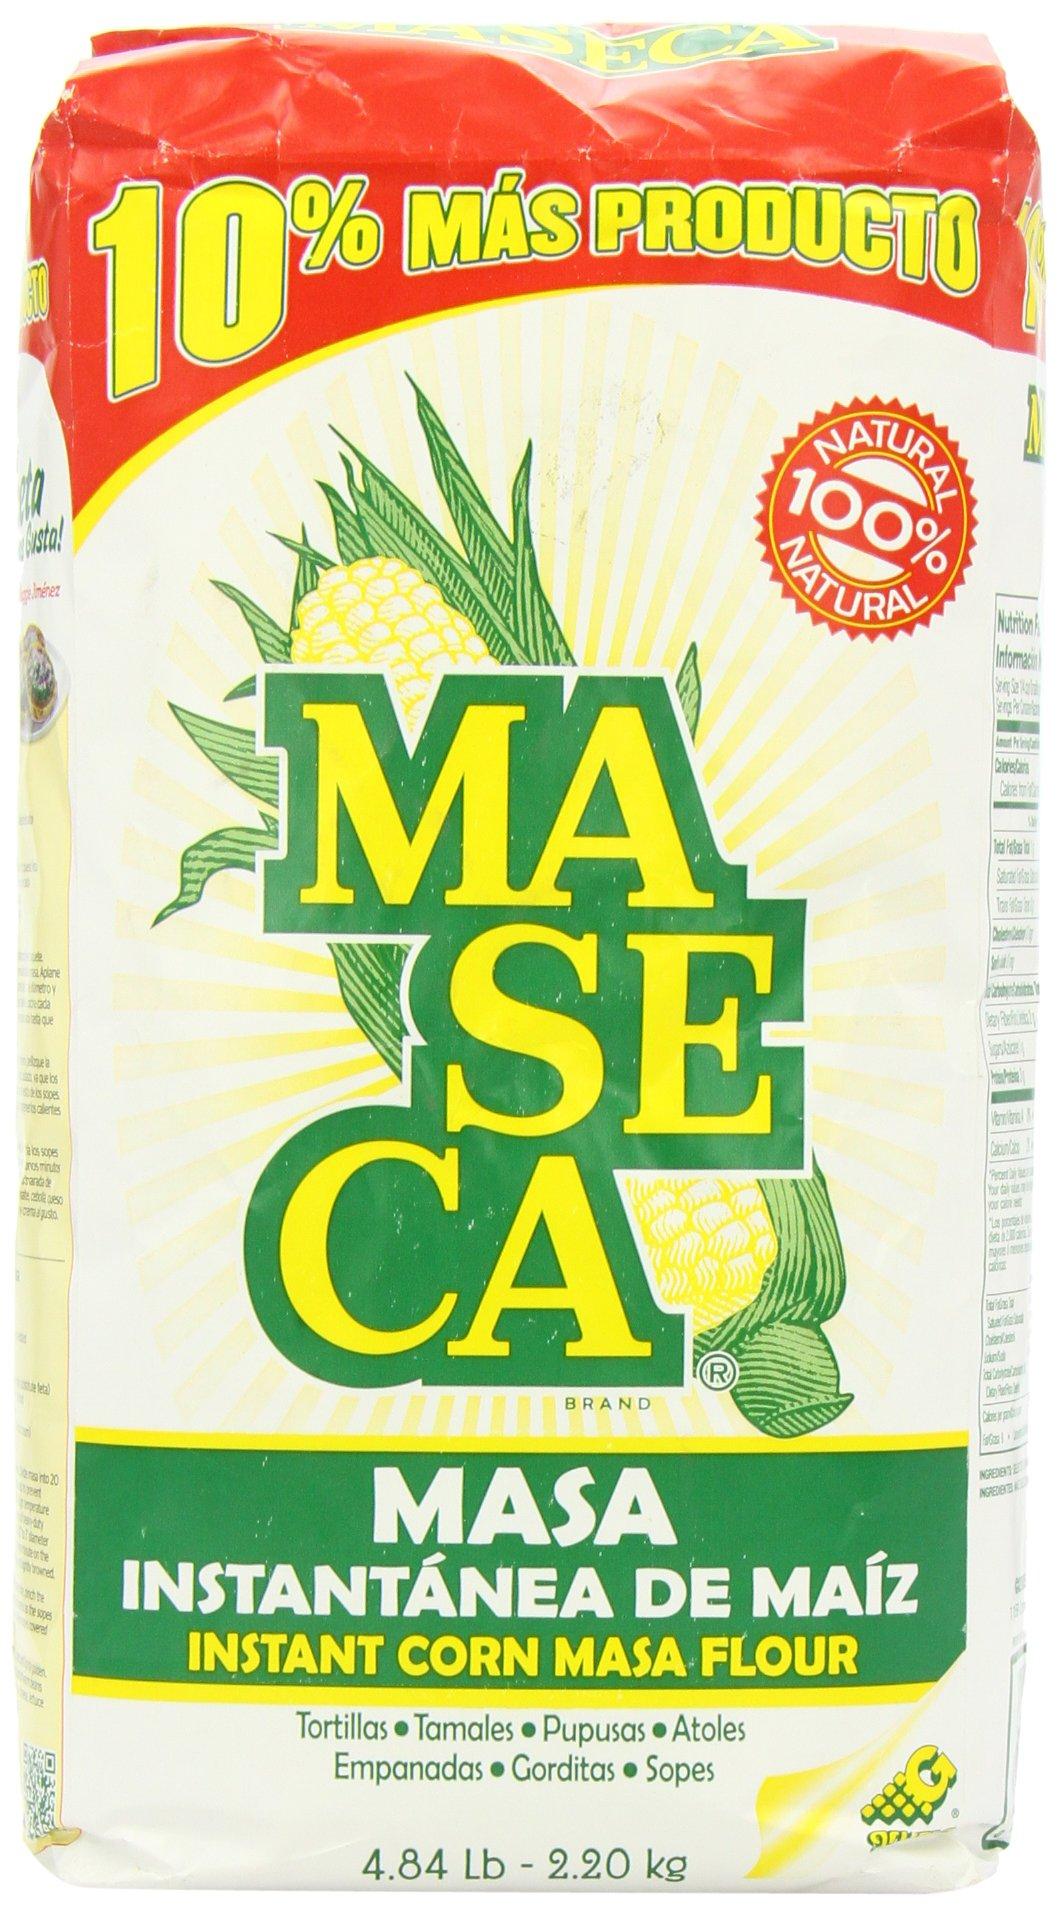 Maseca Instant Yellow Corn Masa Flour 4.84lb | Masa Instantanea de Maiz Amarillo 2.2kg